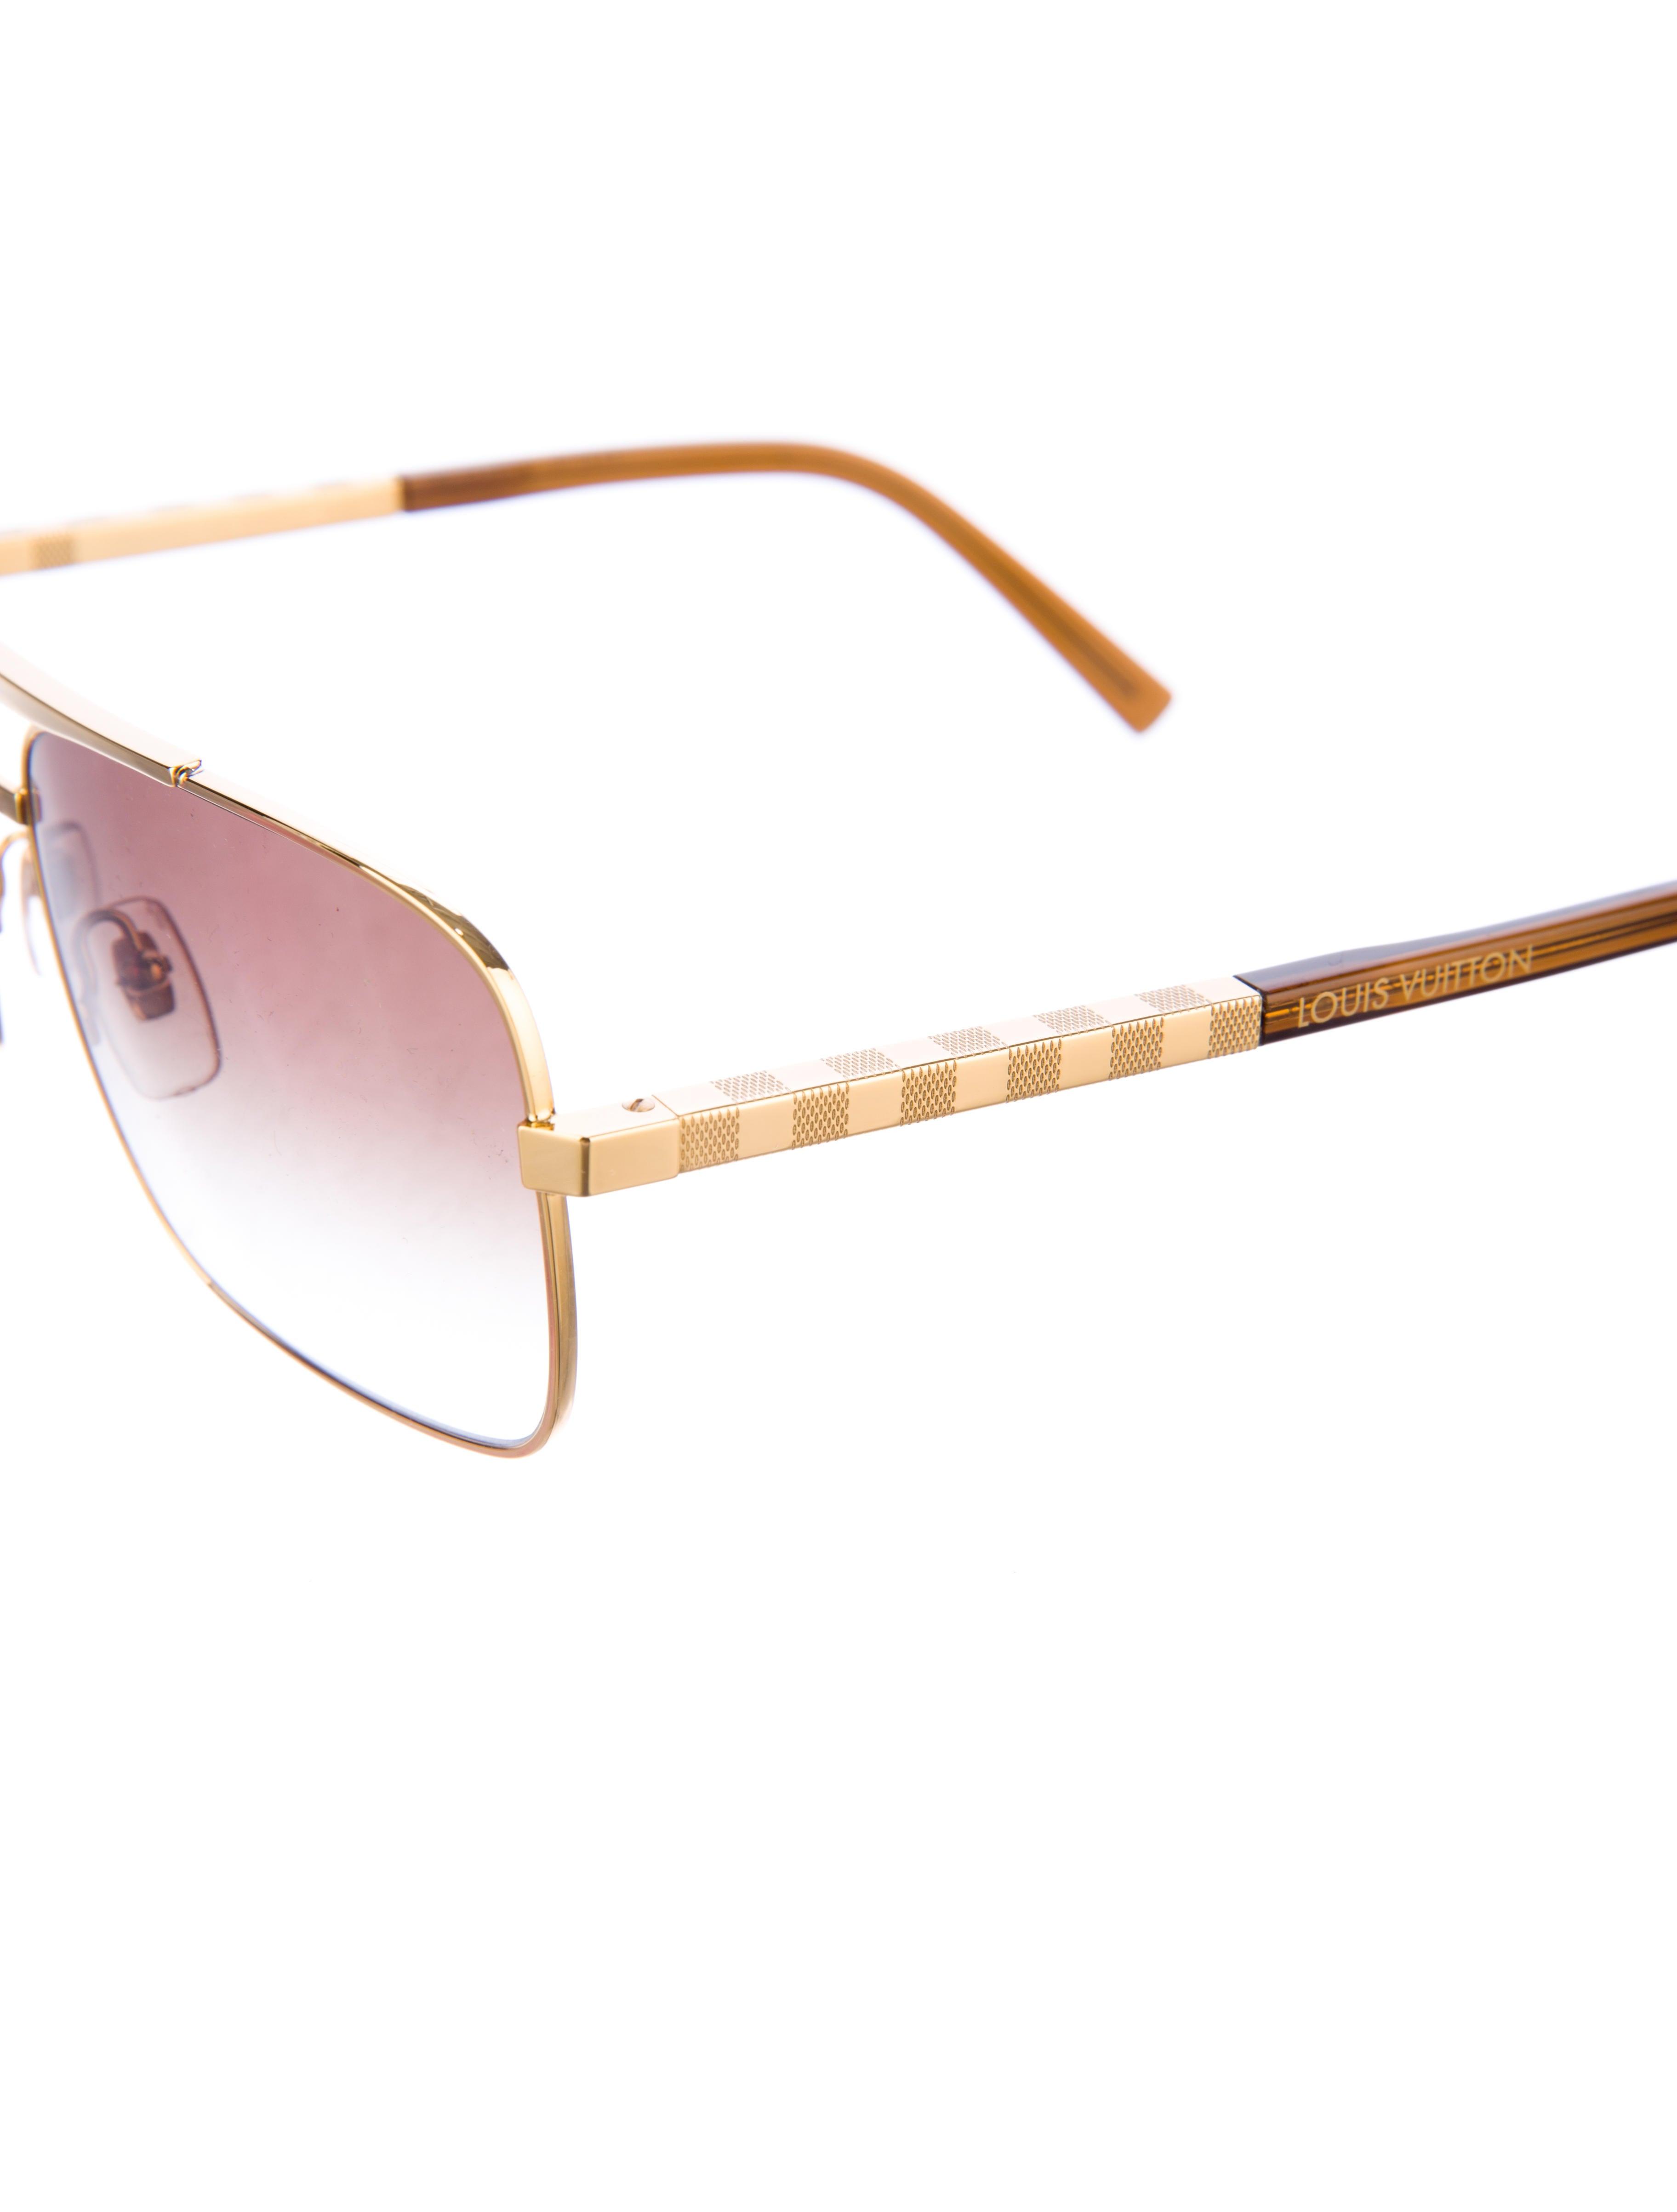 louis vuitton attitude sunglasses accessories lou35954